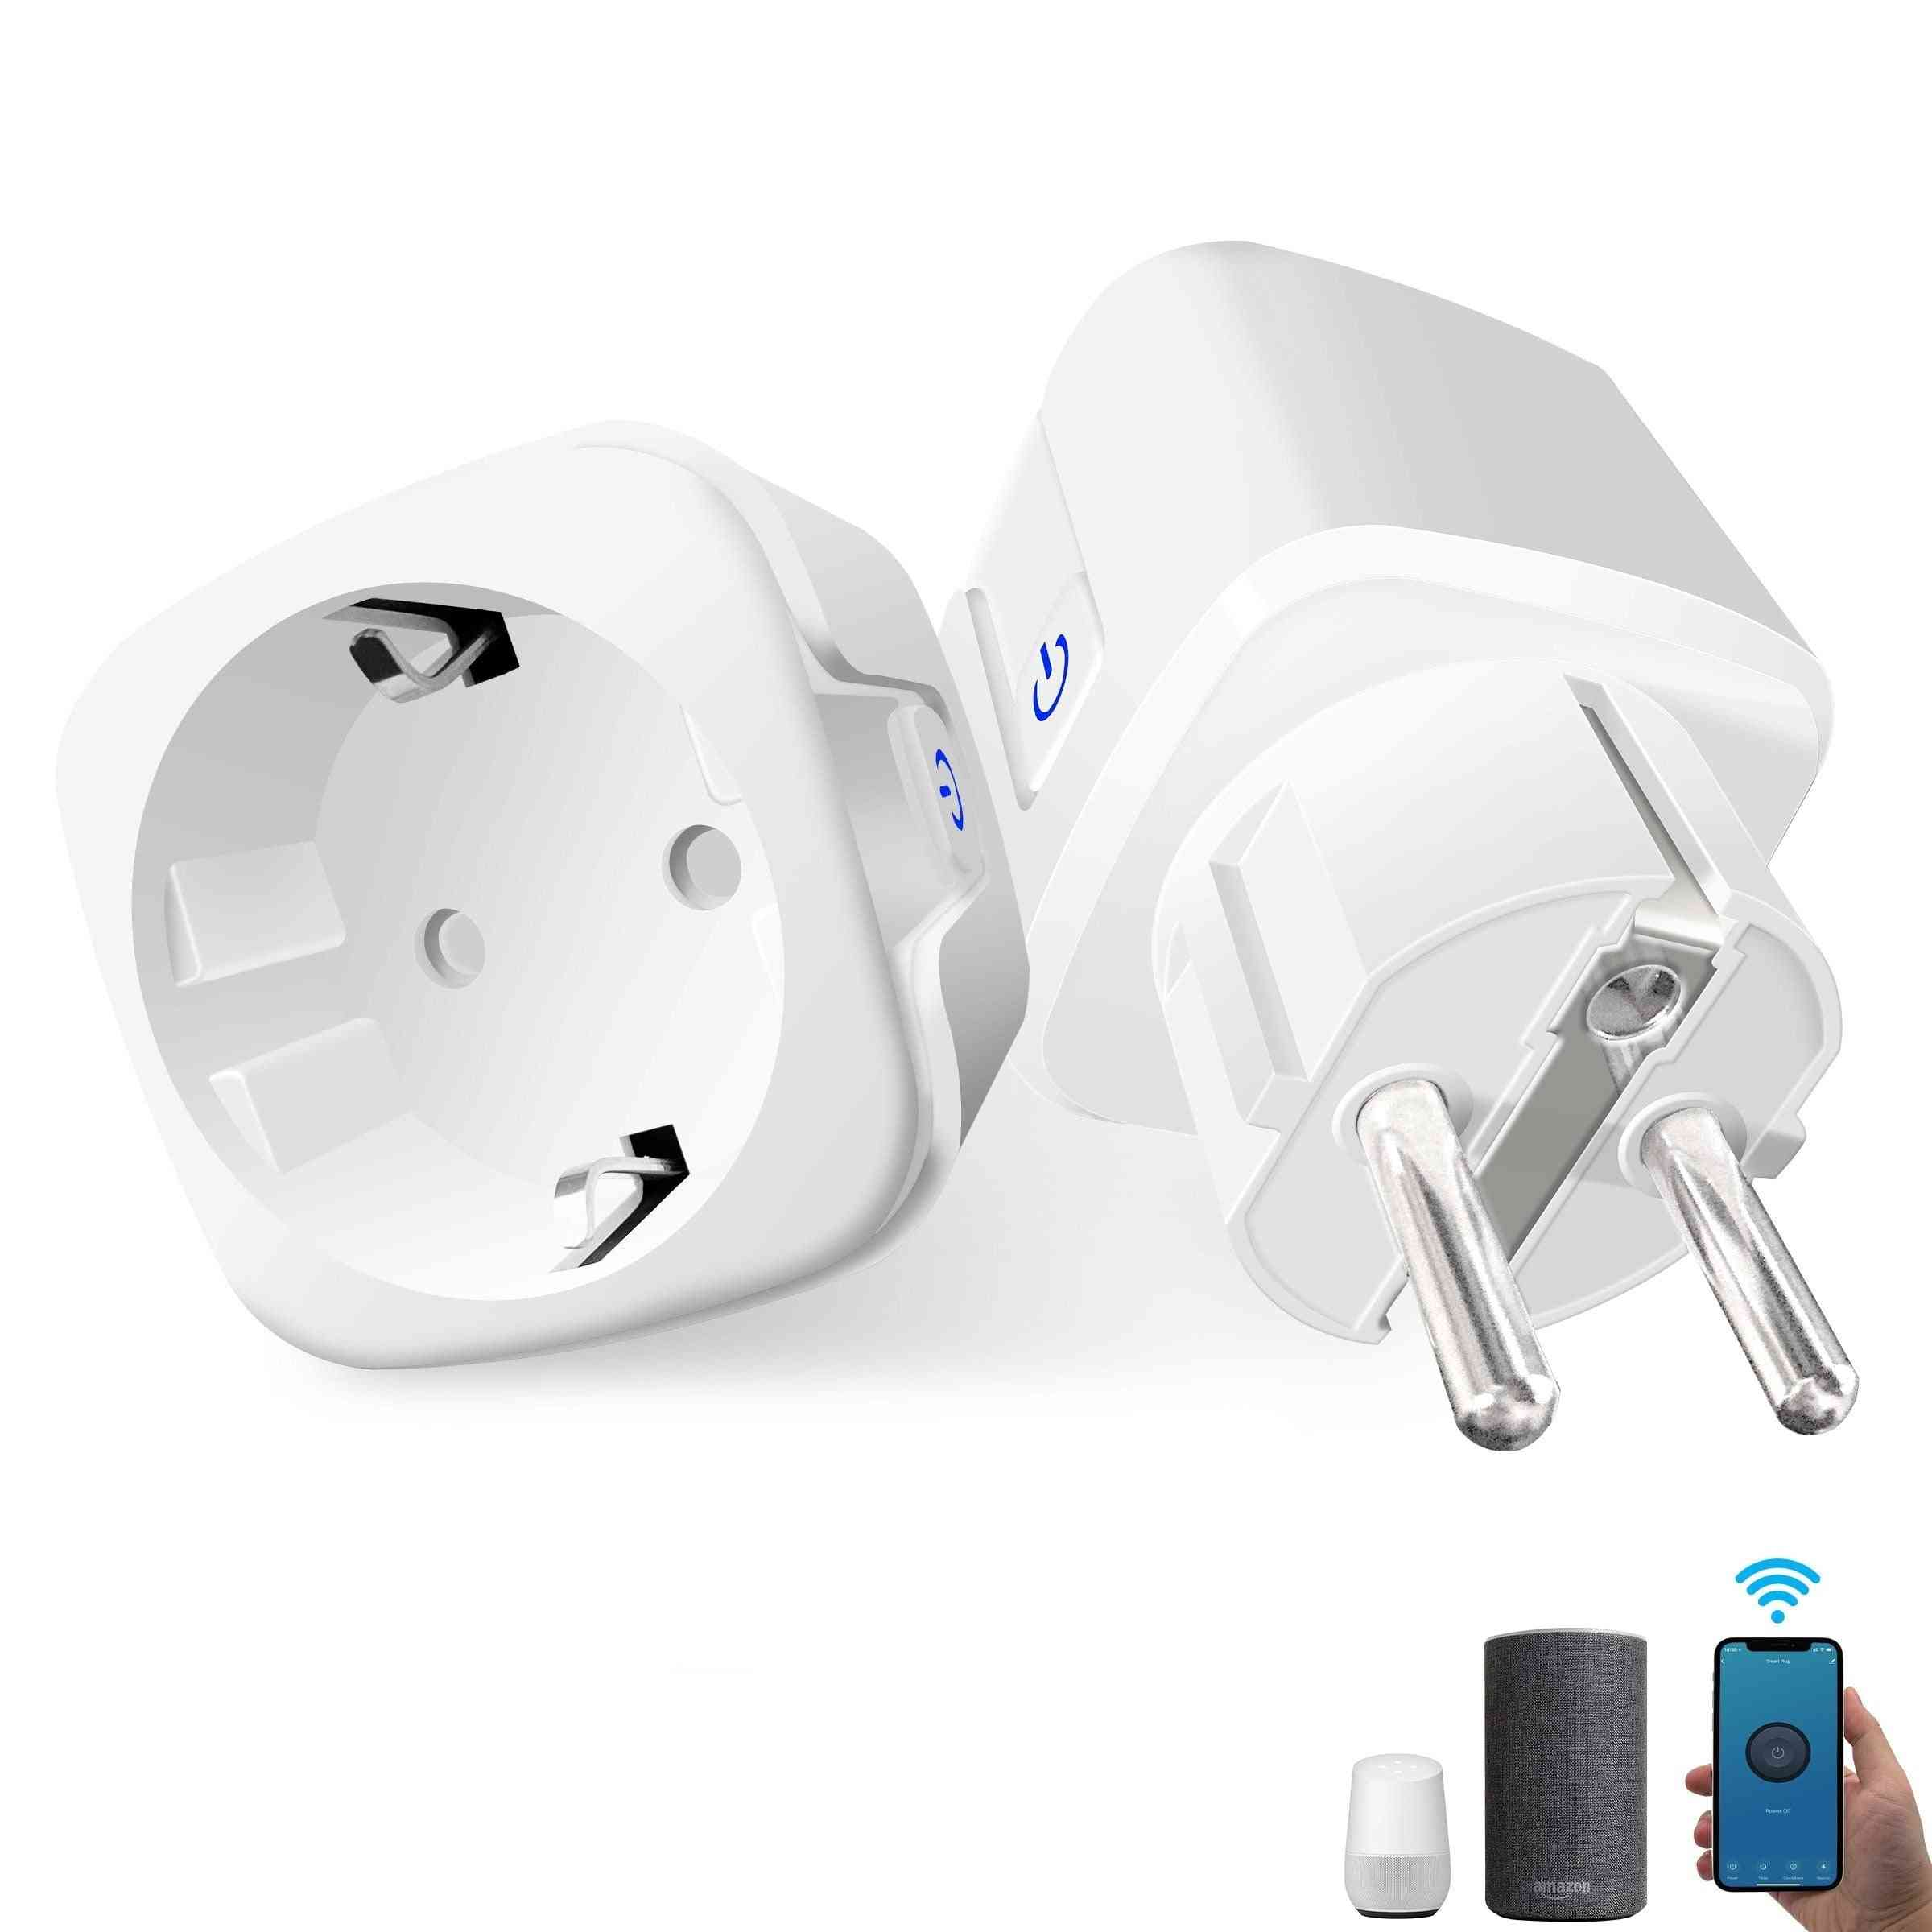 16a Eu Smart Home Wifi Wireless Socket Outlet With Alexa Google Home